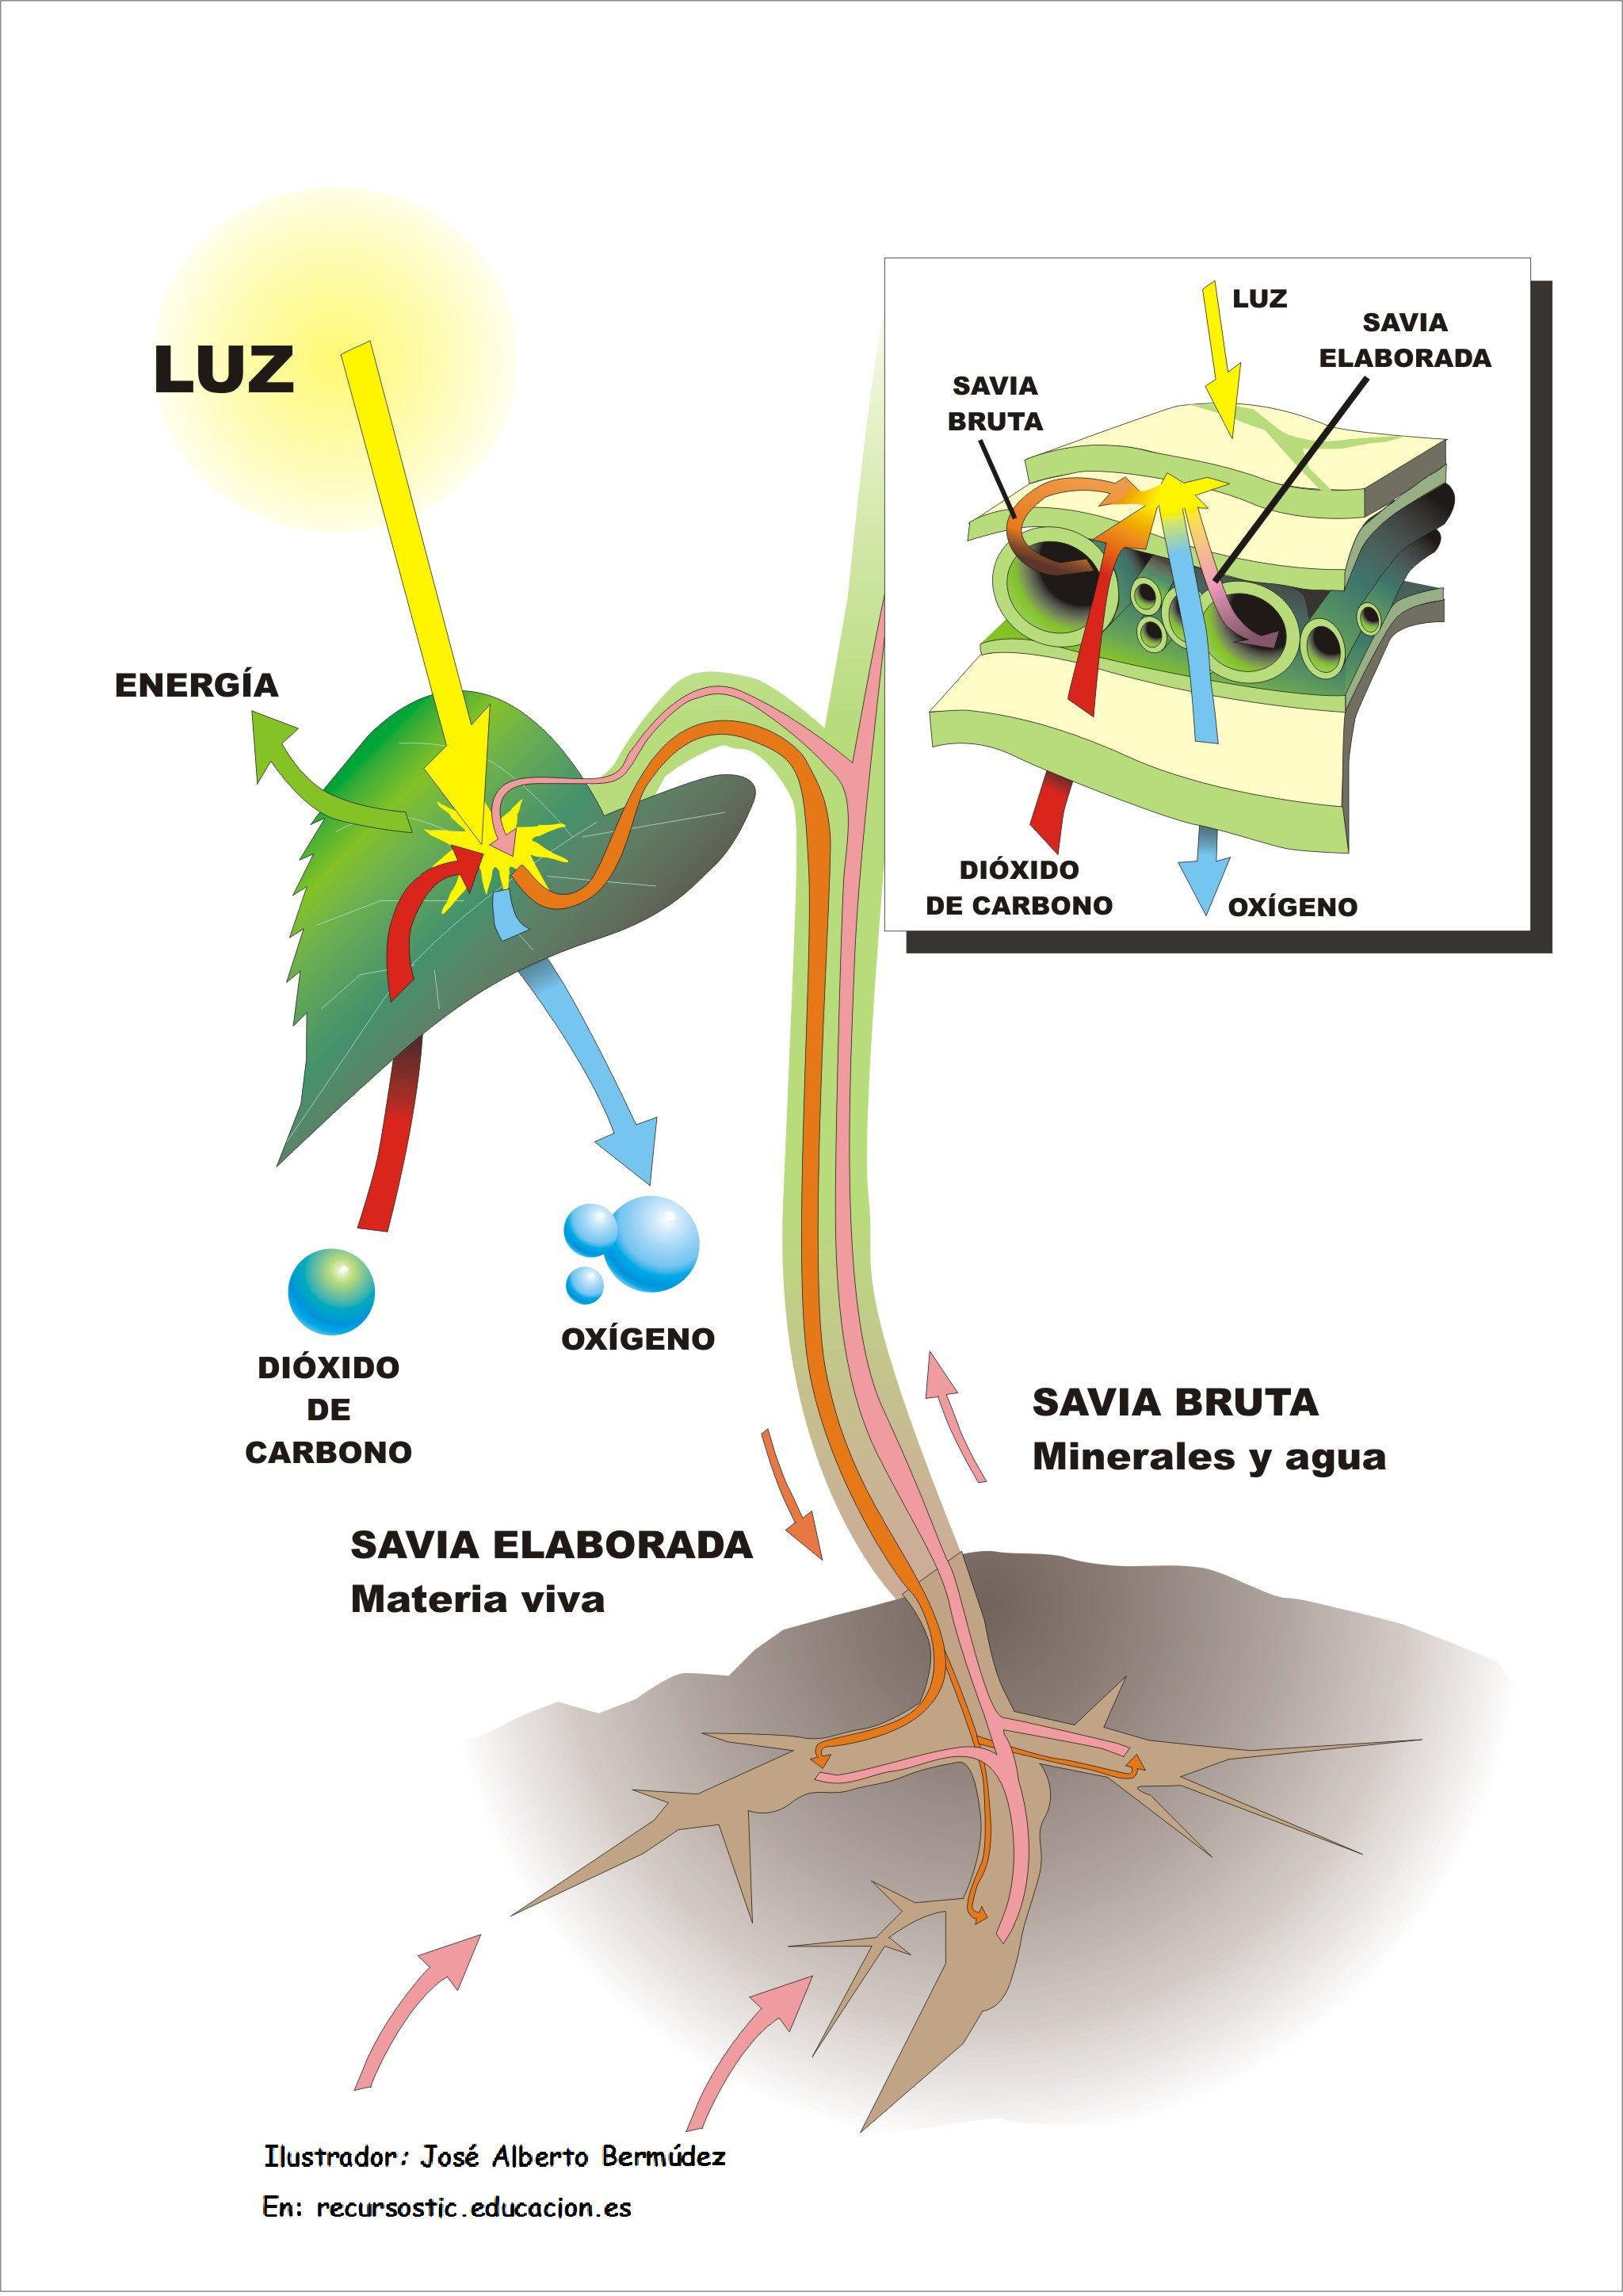 La Fotosintesis 5to Grado Material De Aprendizaje Fotosintesis Fotosintesis De Las Plantas Aprendizaje